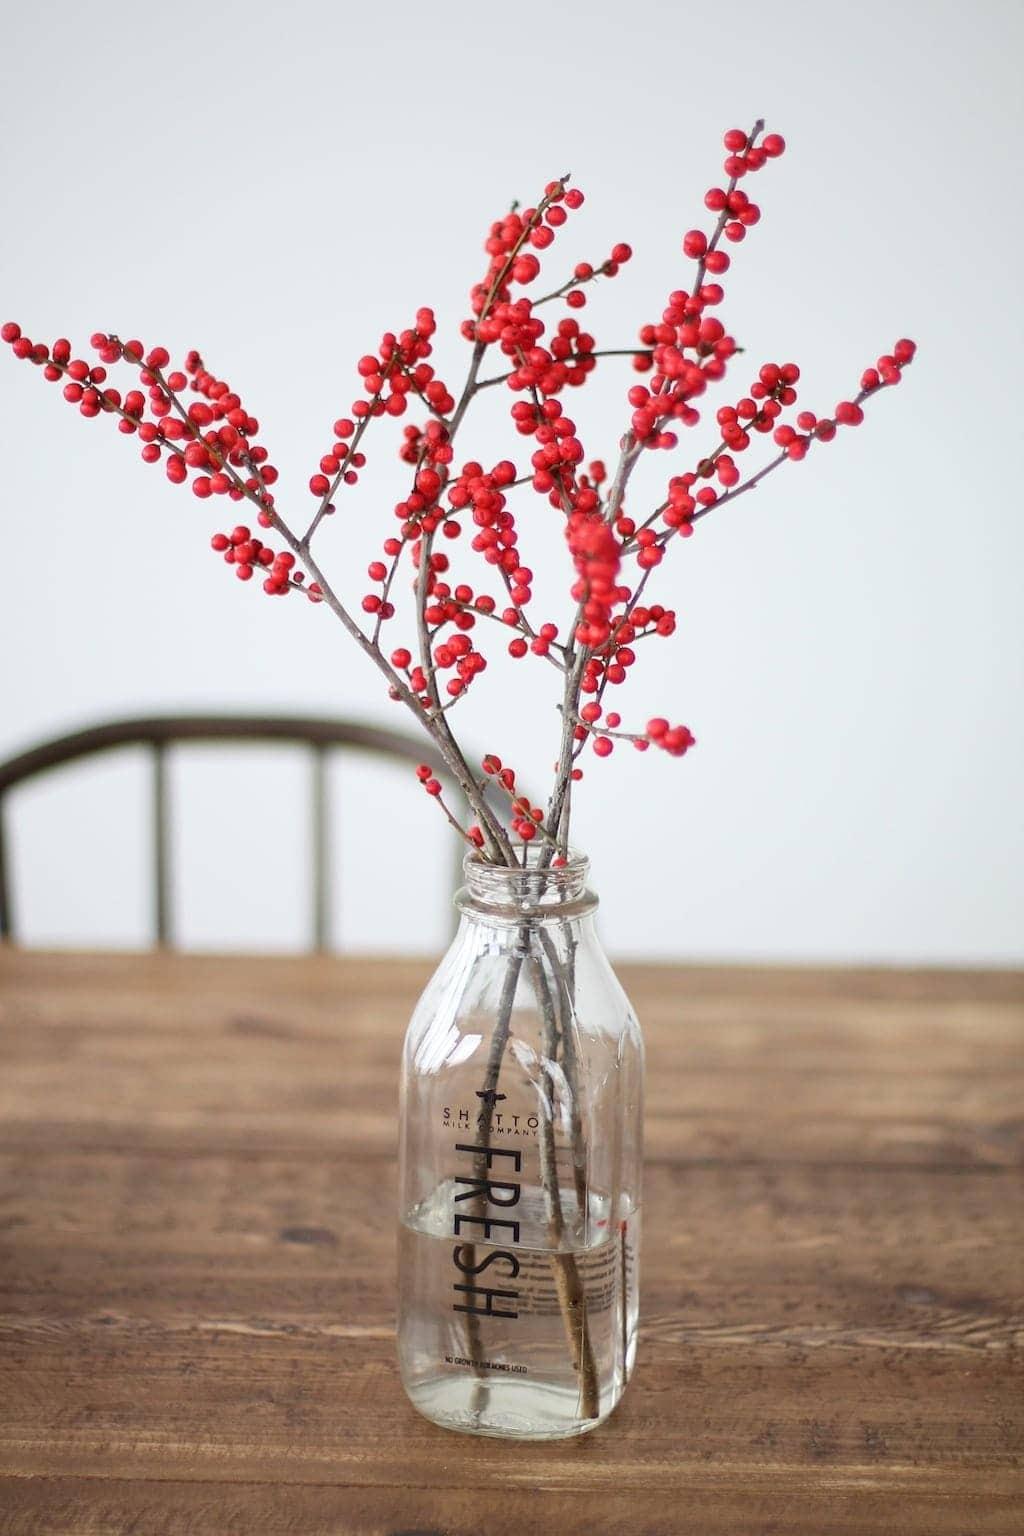 5 Minute DIY Christmas Centerpiece with Pinecones  Berries